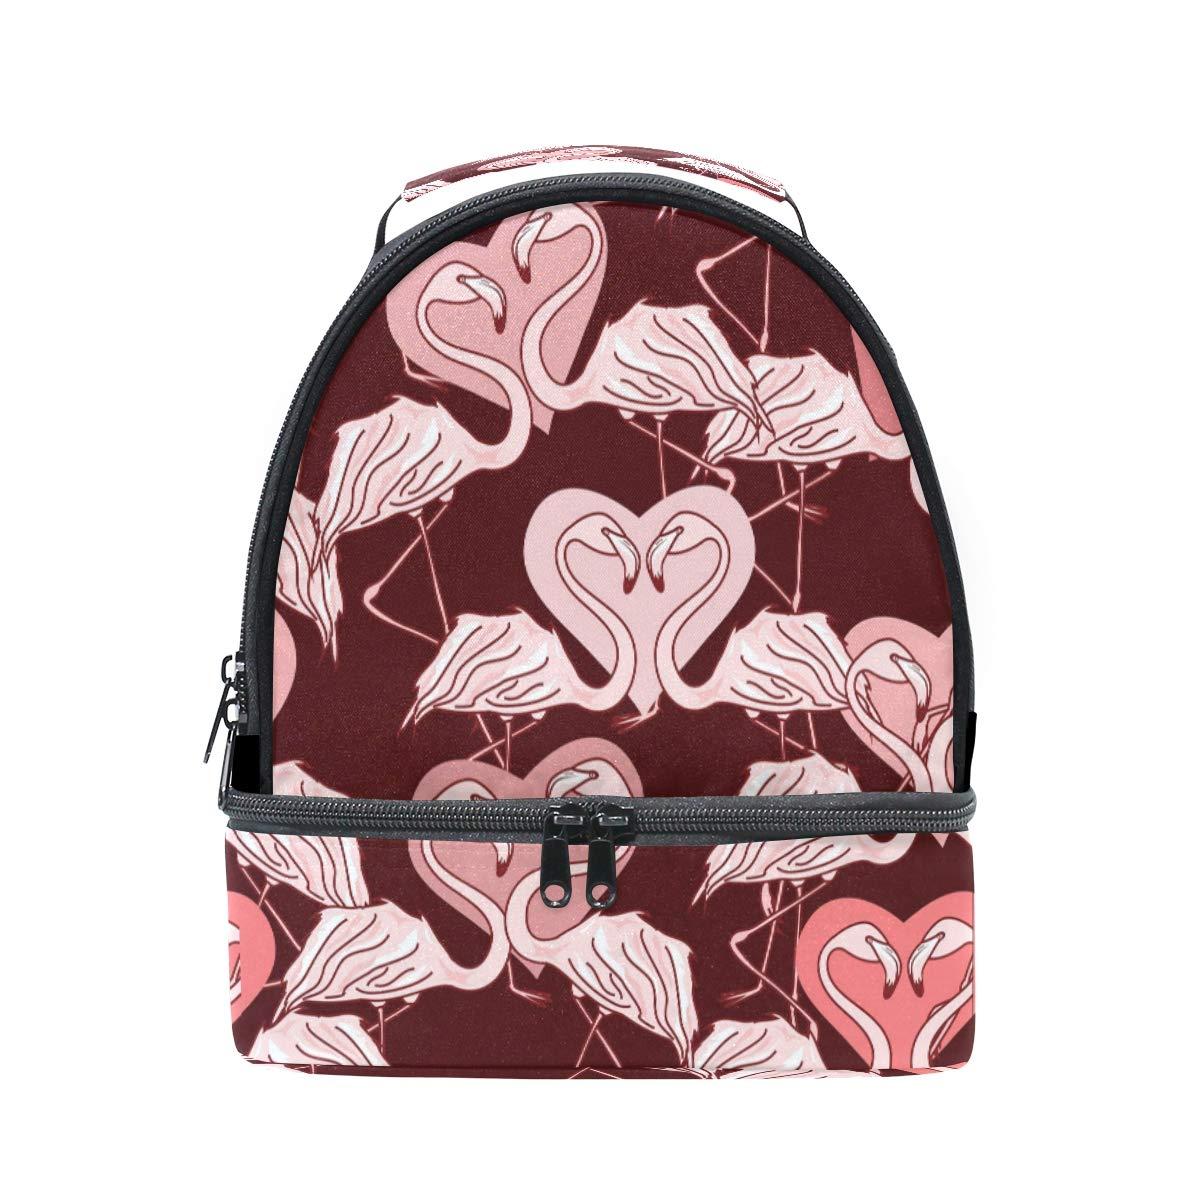 ALAZA Love Heart - Bolsa de almuerzo para el aire libre, diseño de flamencos